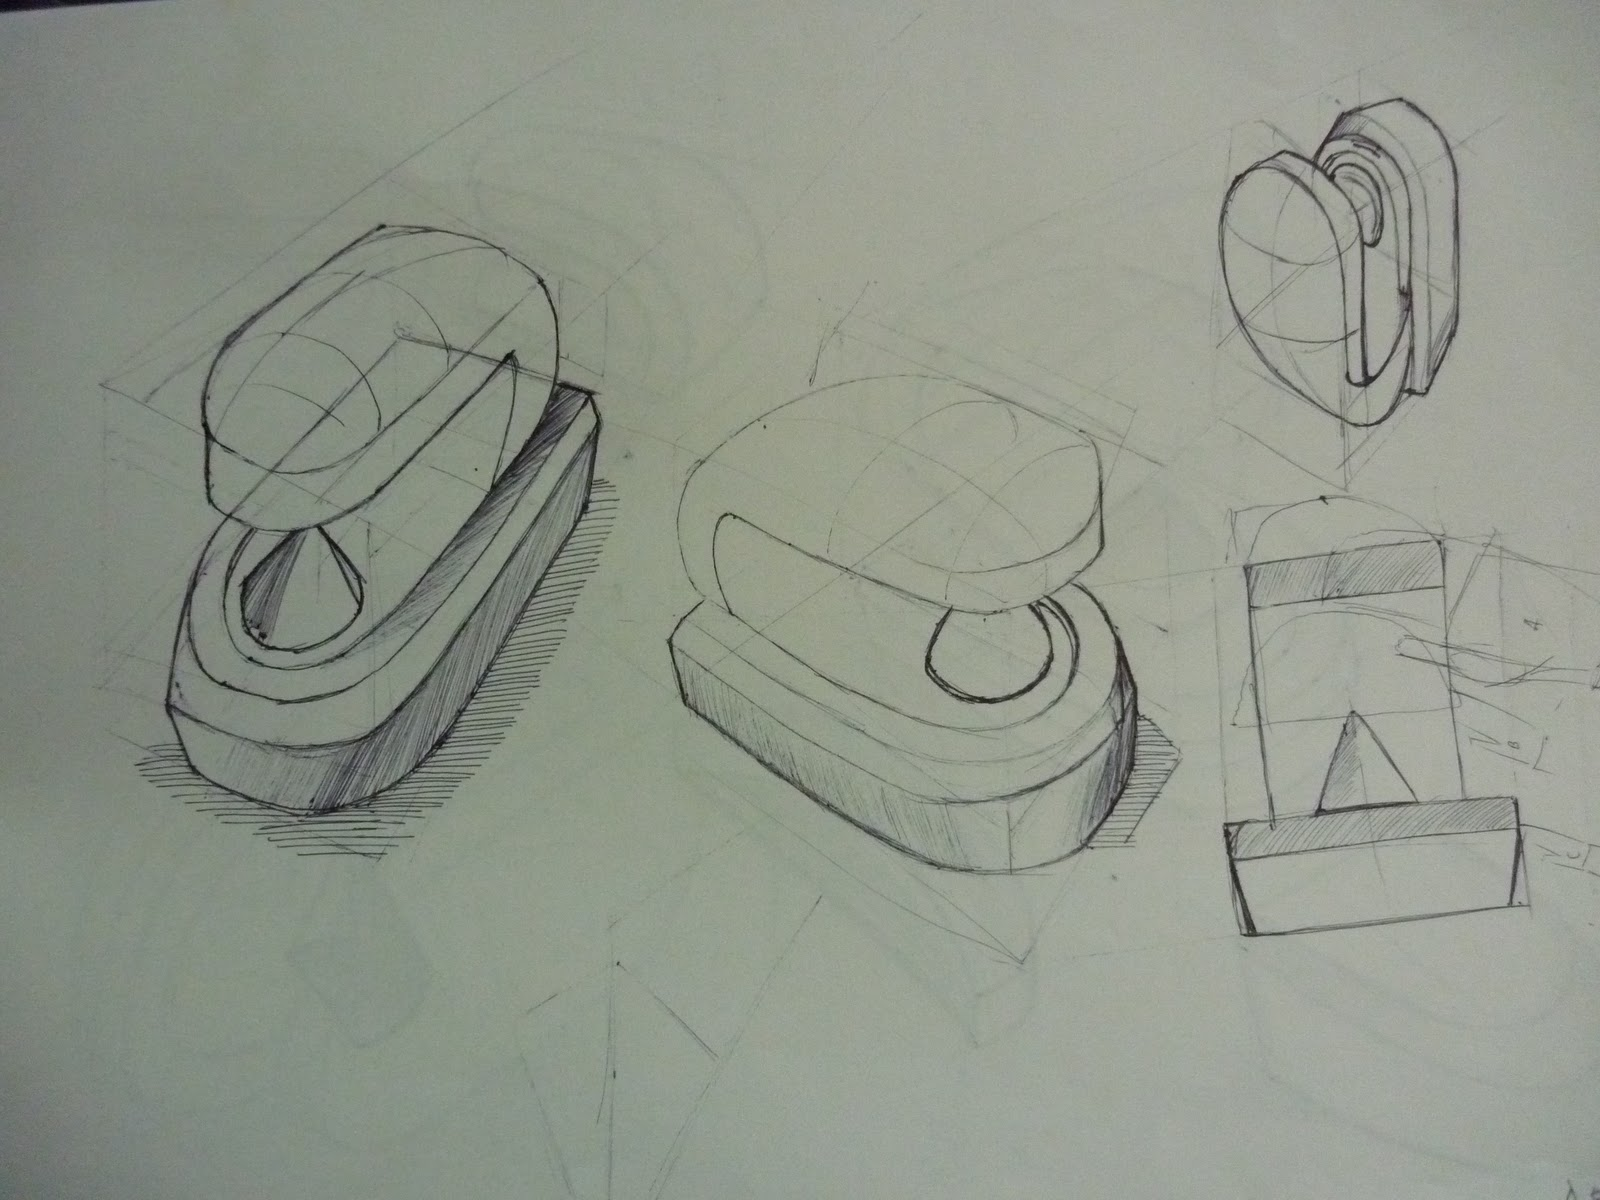 Dise o industrial isacris dibujo tostadora de bagels - Tostadora diseno ...